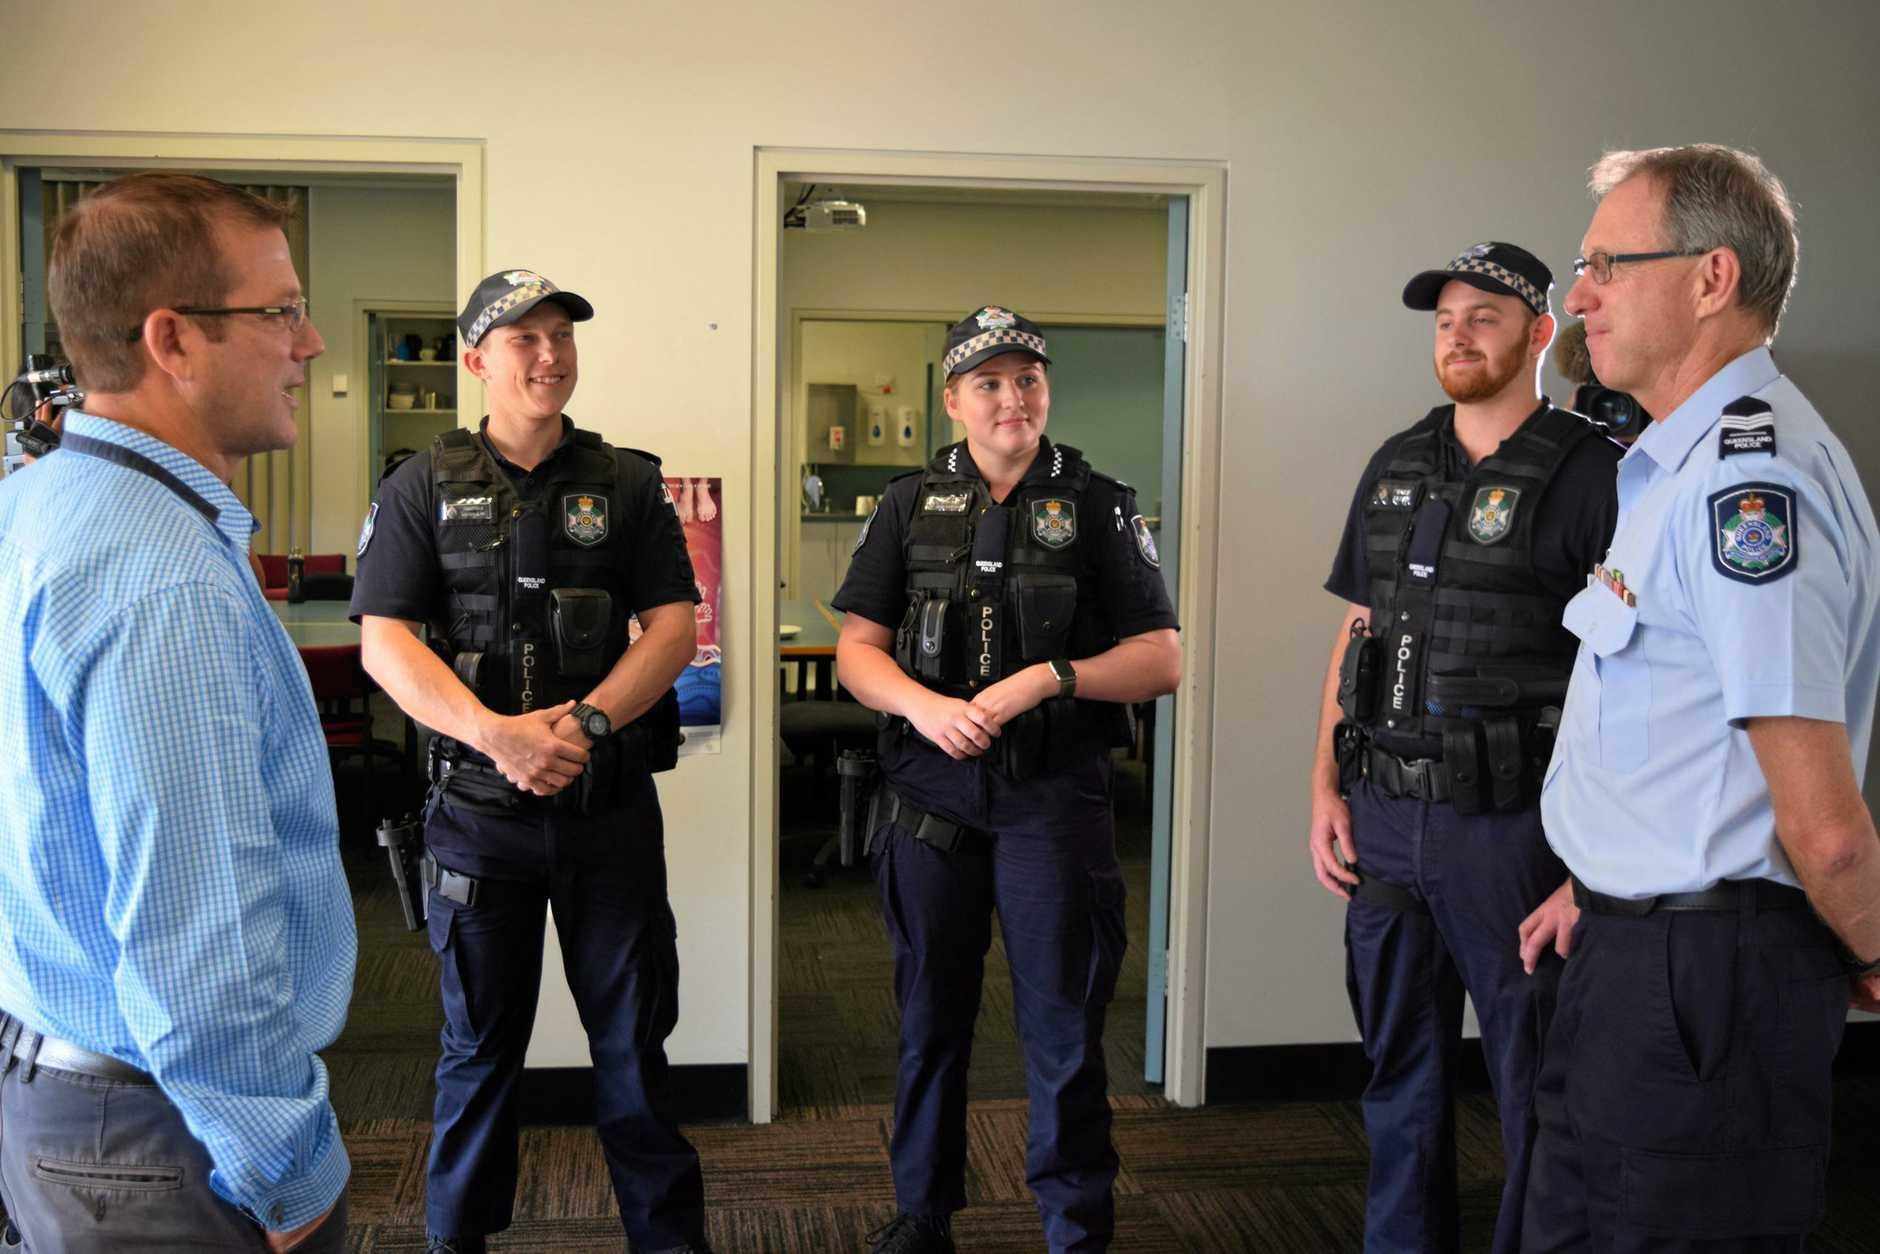 NEW POLICE: David Batt MP, Constable Cameron Bass, Constable Hayden Busk, Constable Maddy Strohfelde and Acting Inspector Glenn Cameron.